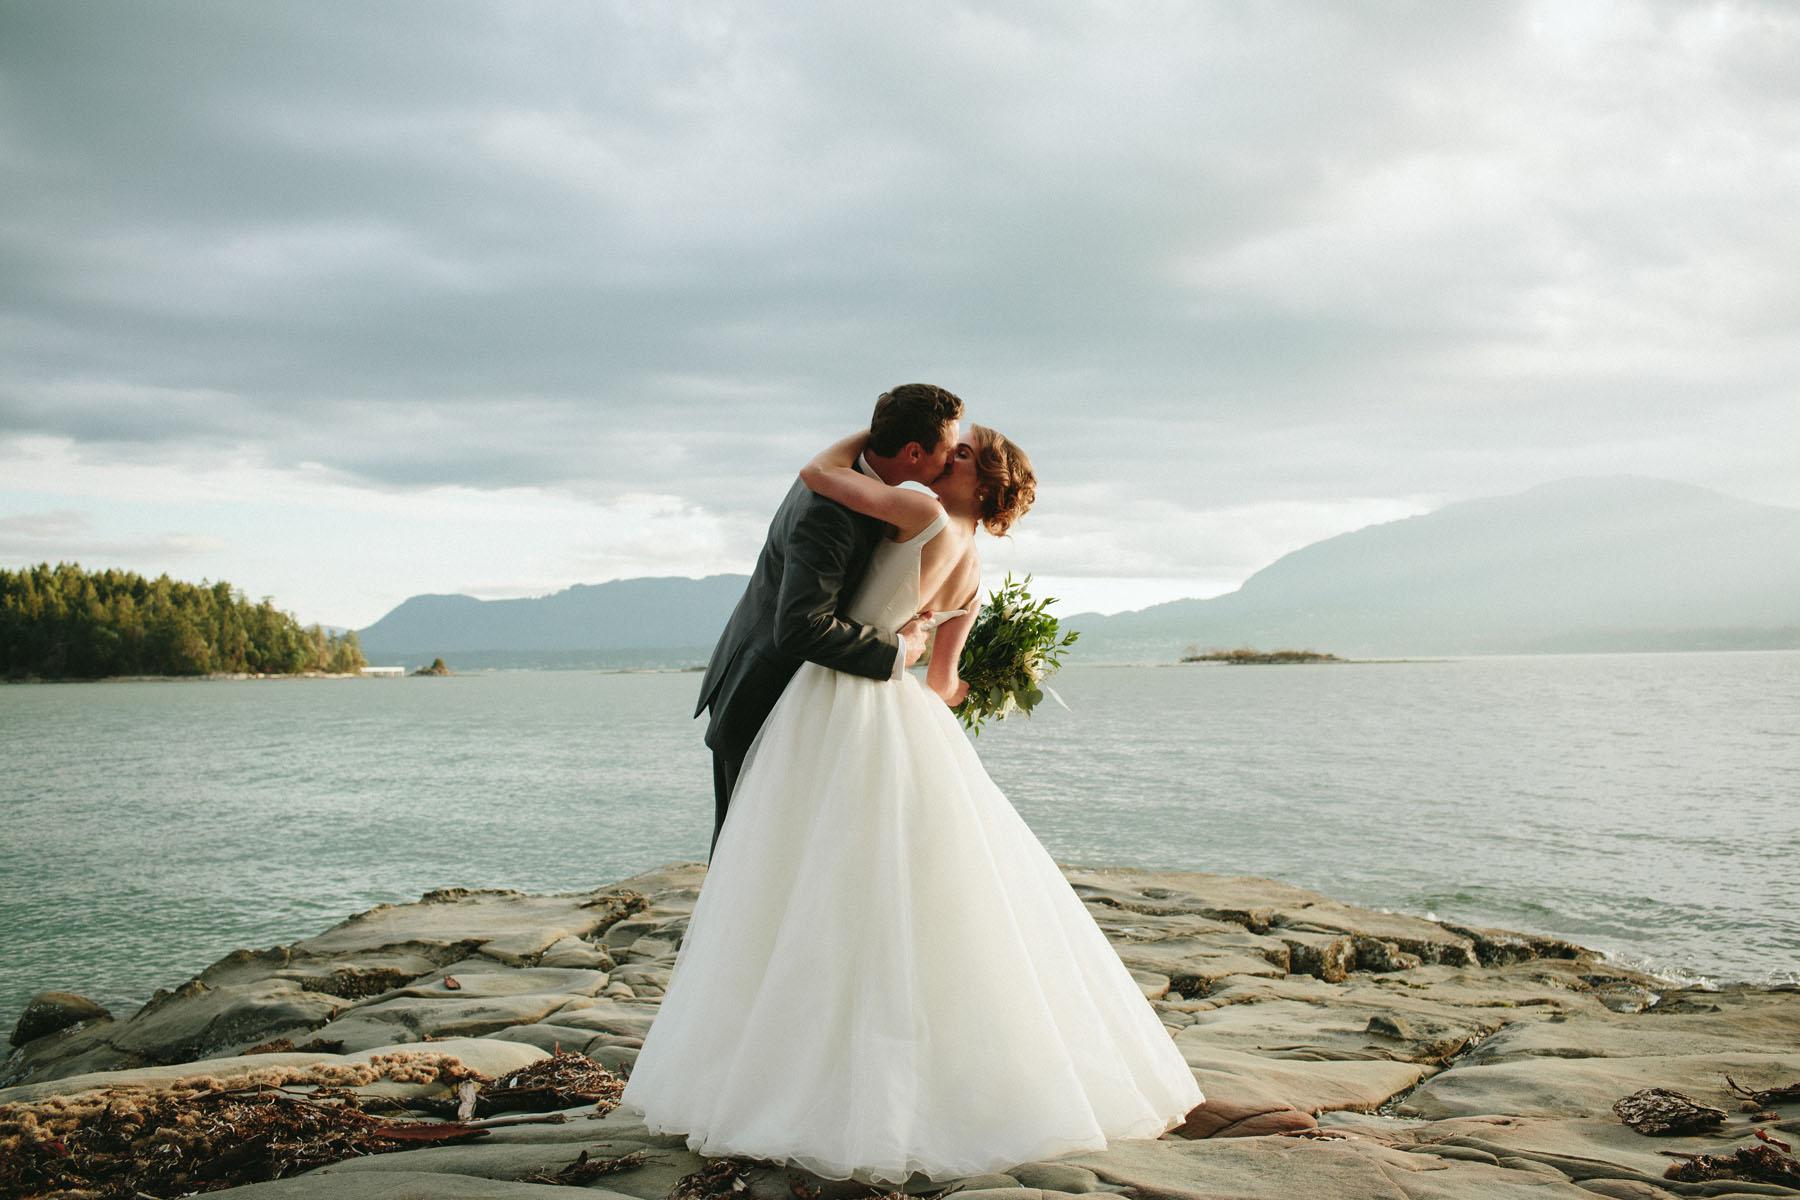 thetis-island-wedding-photographer-rp-rn-135.jpg